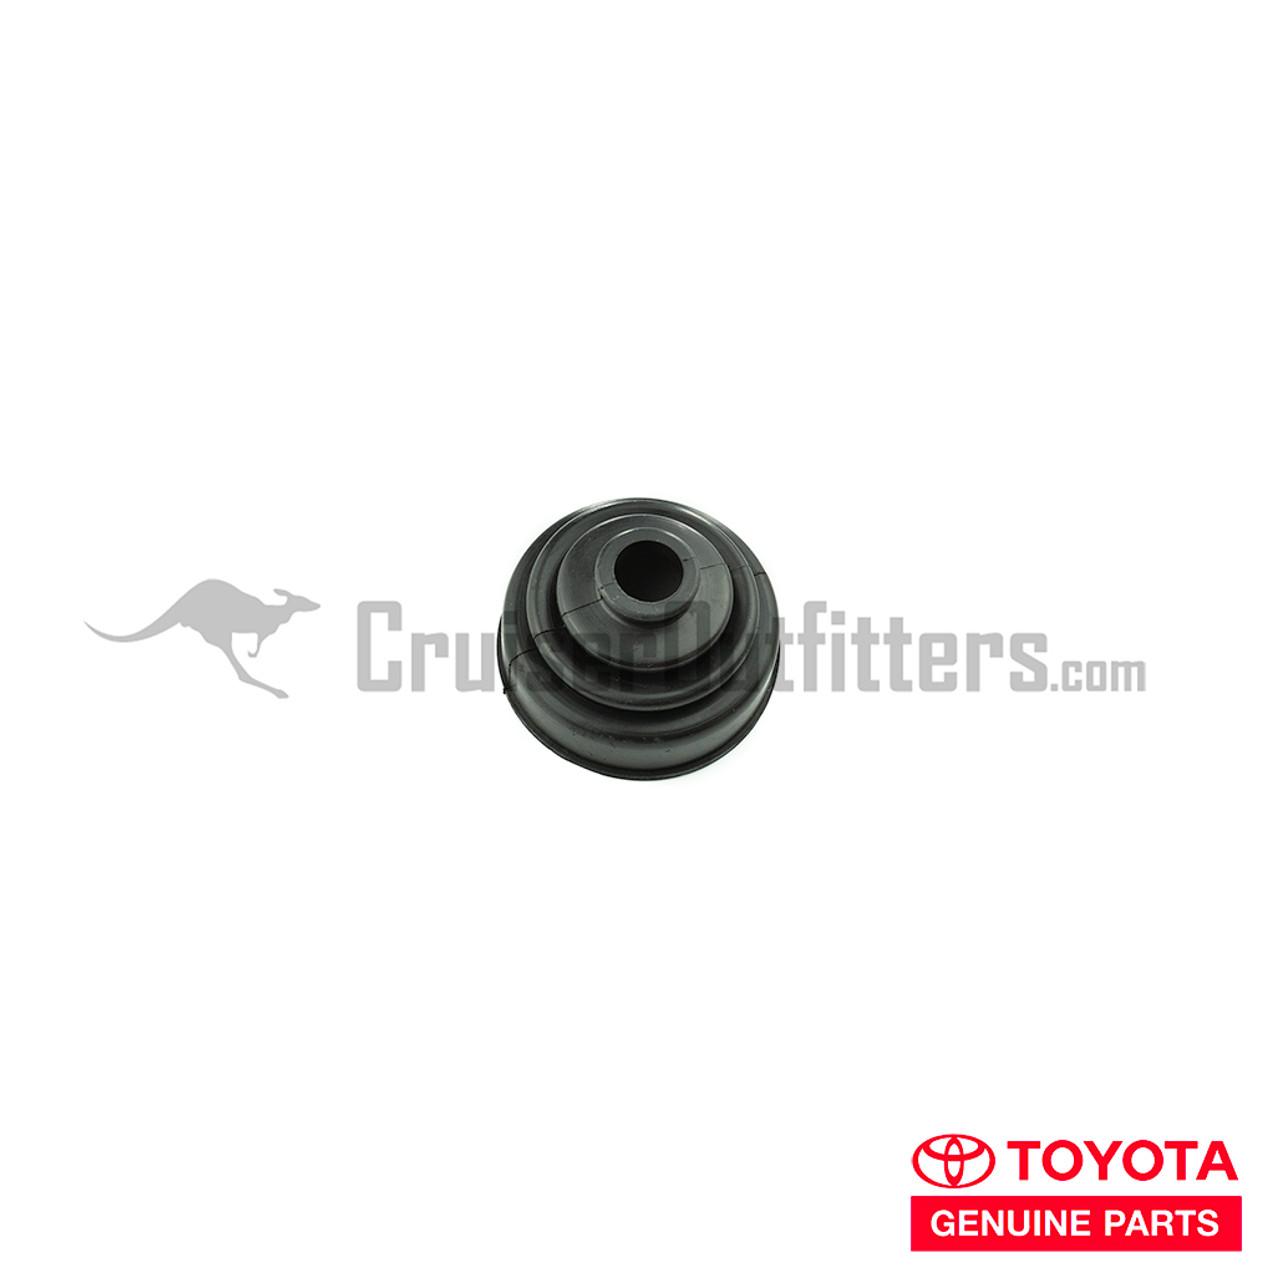 Transmission Inner Dust Boot - OEM Toyota - Fits (INT55010)